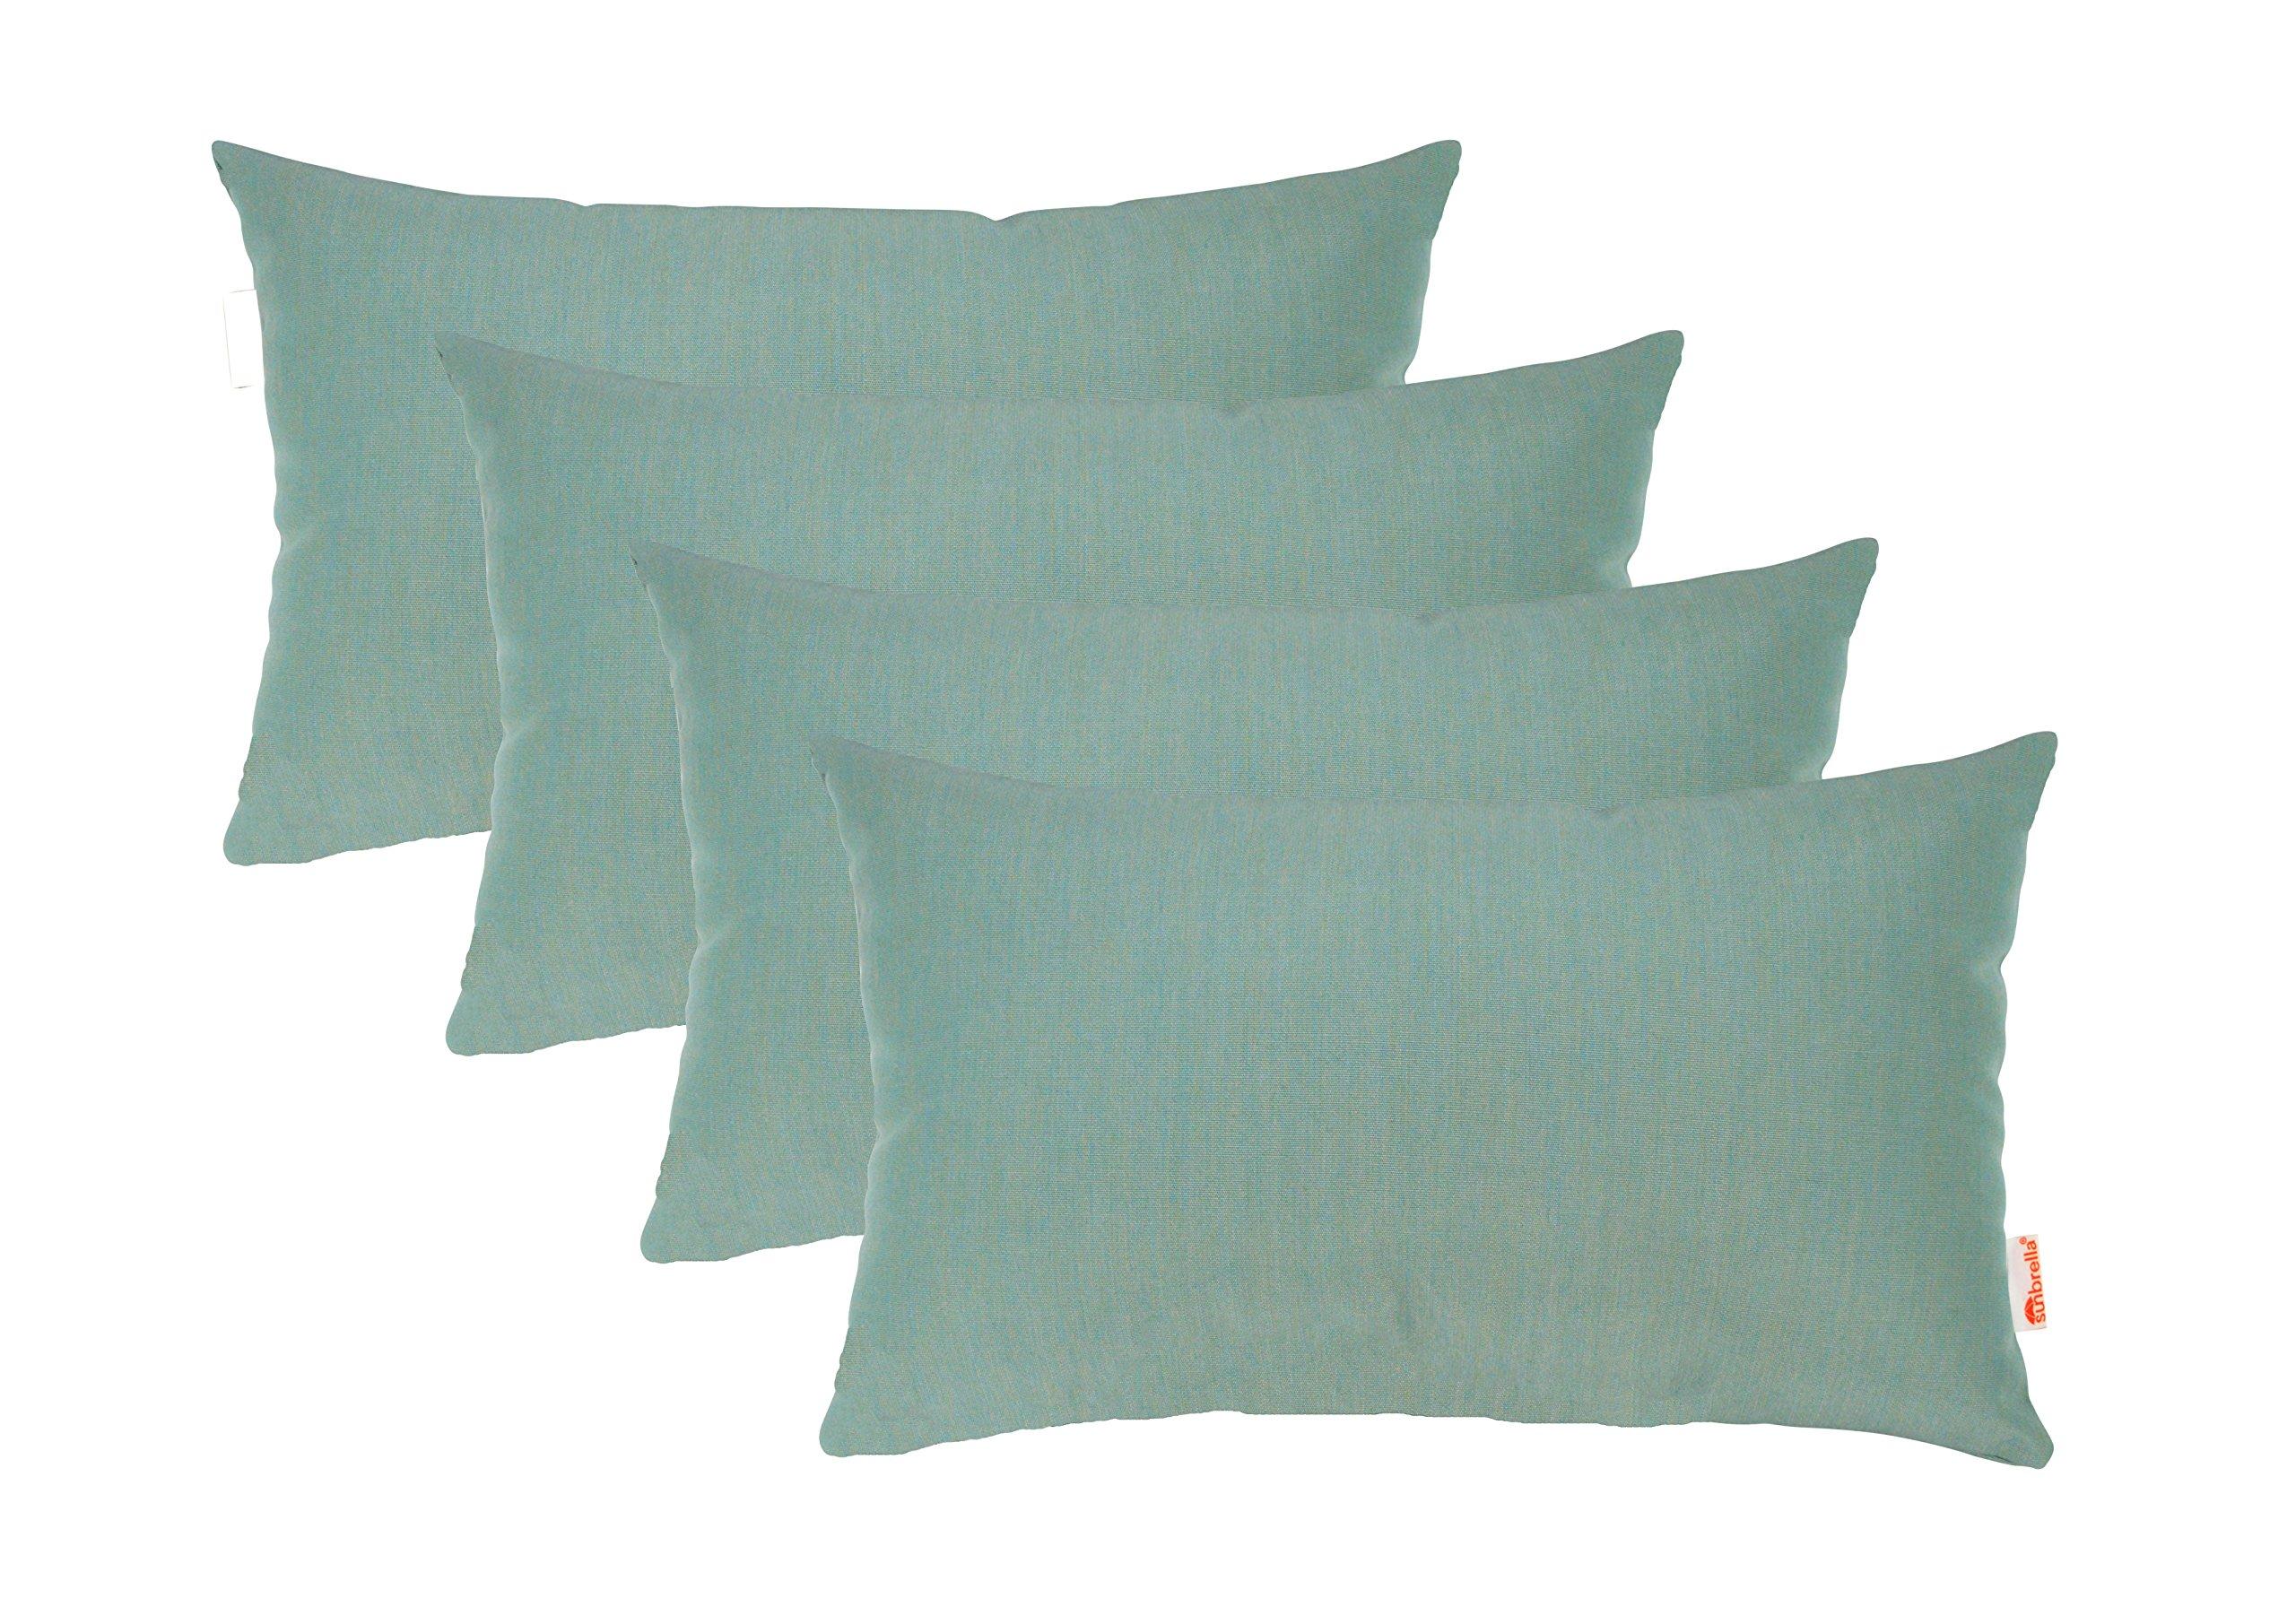 RSH Décor Set of 4 Indoor/Outdoor Decorative Throw Pillows Sunbrella Canvas Spa - Choose Size (12'' x 20'')